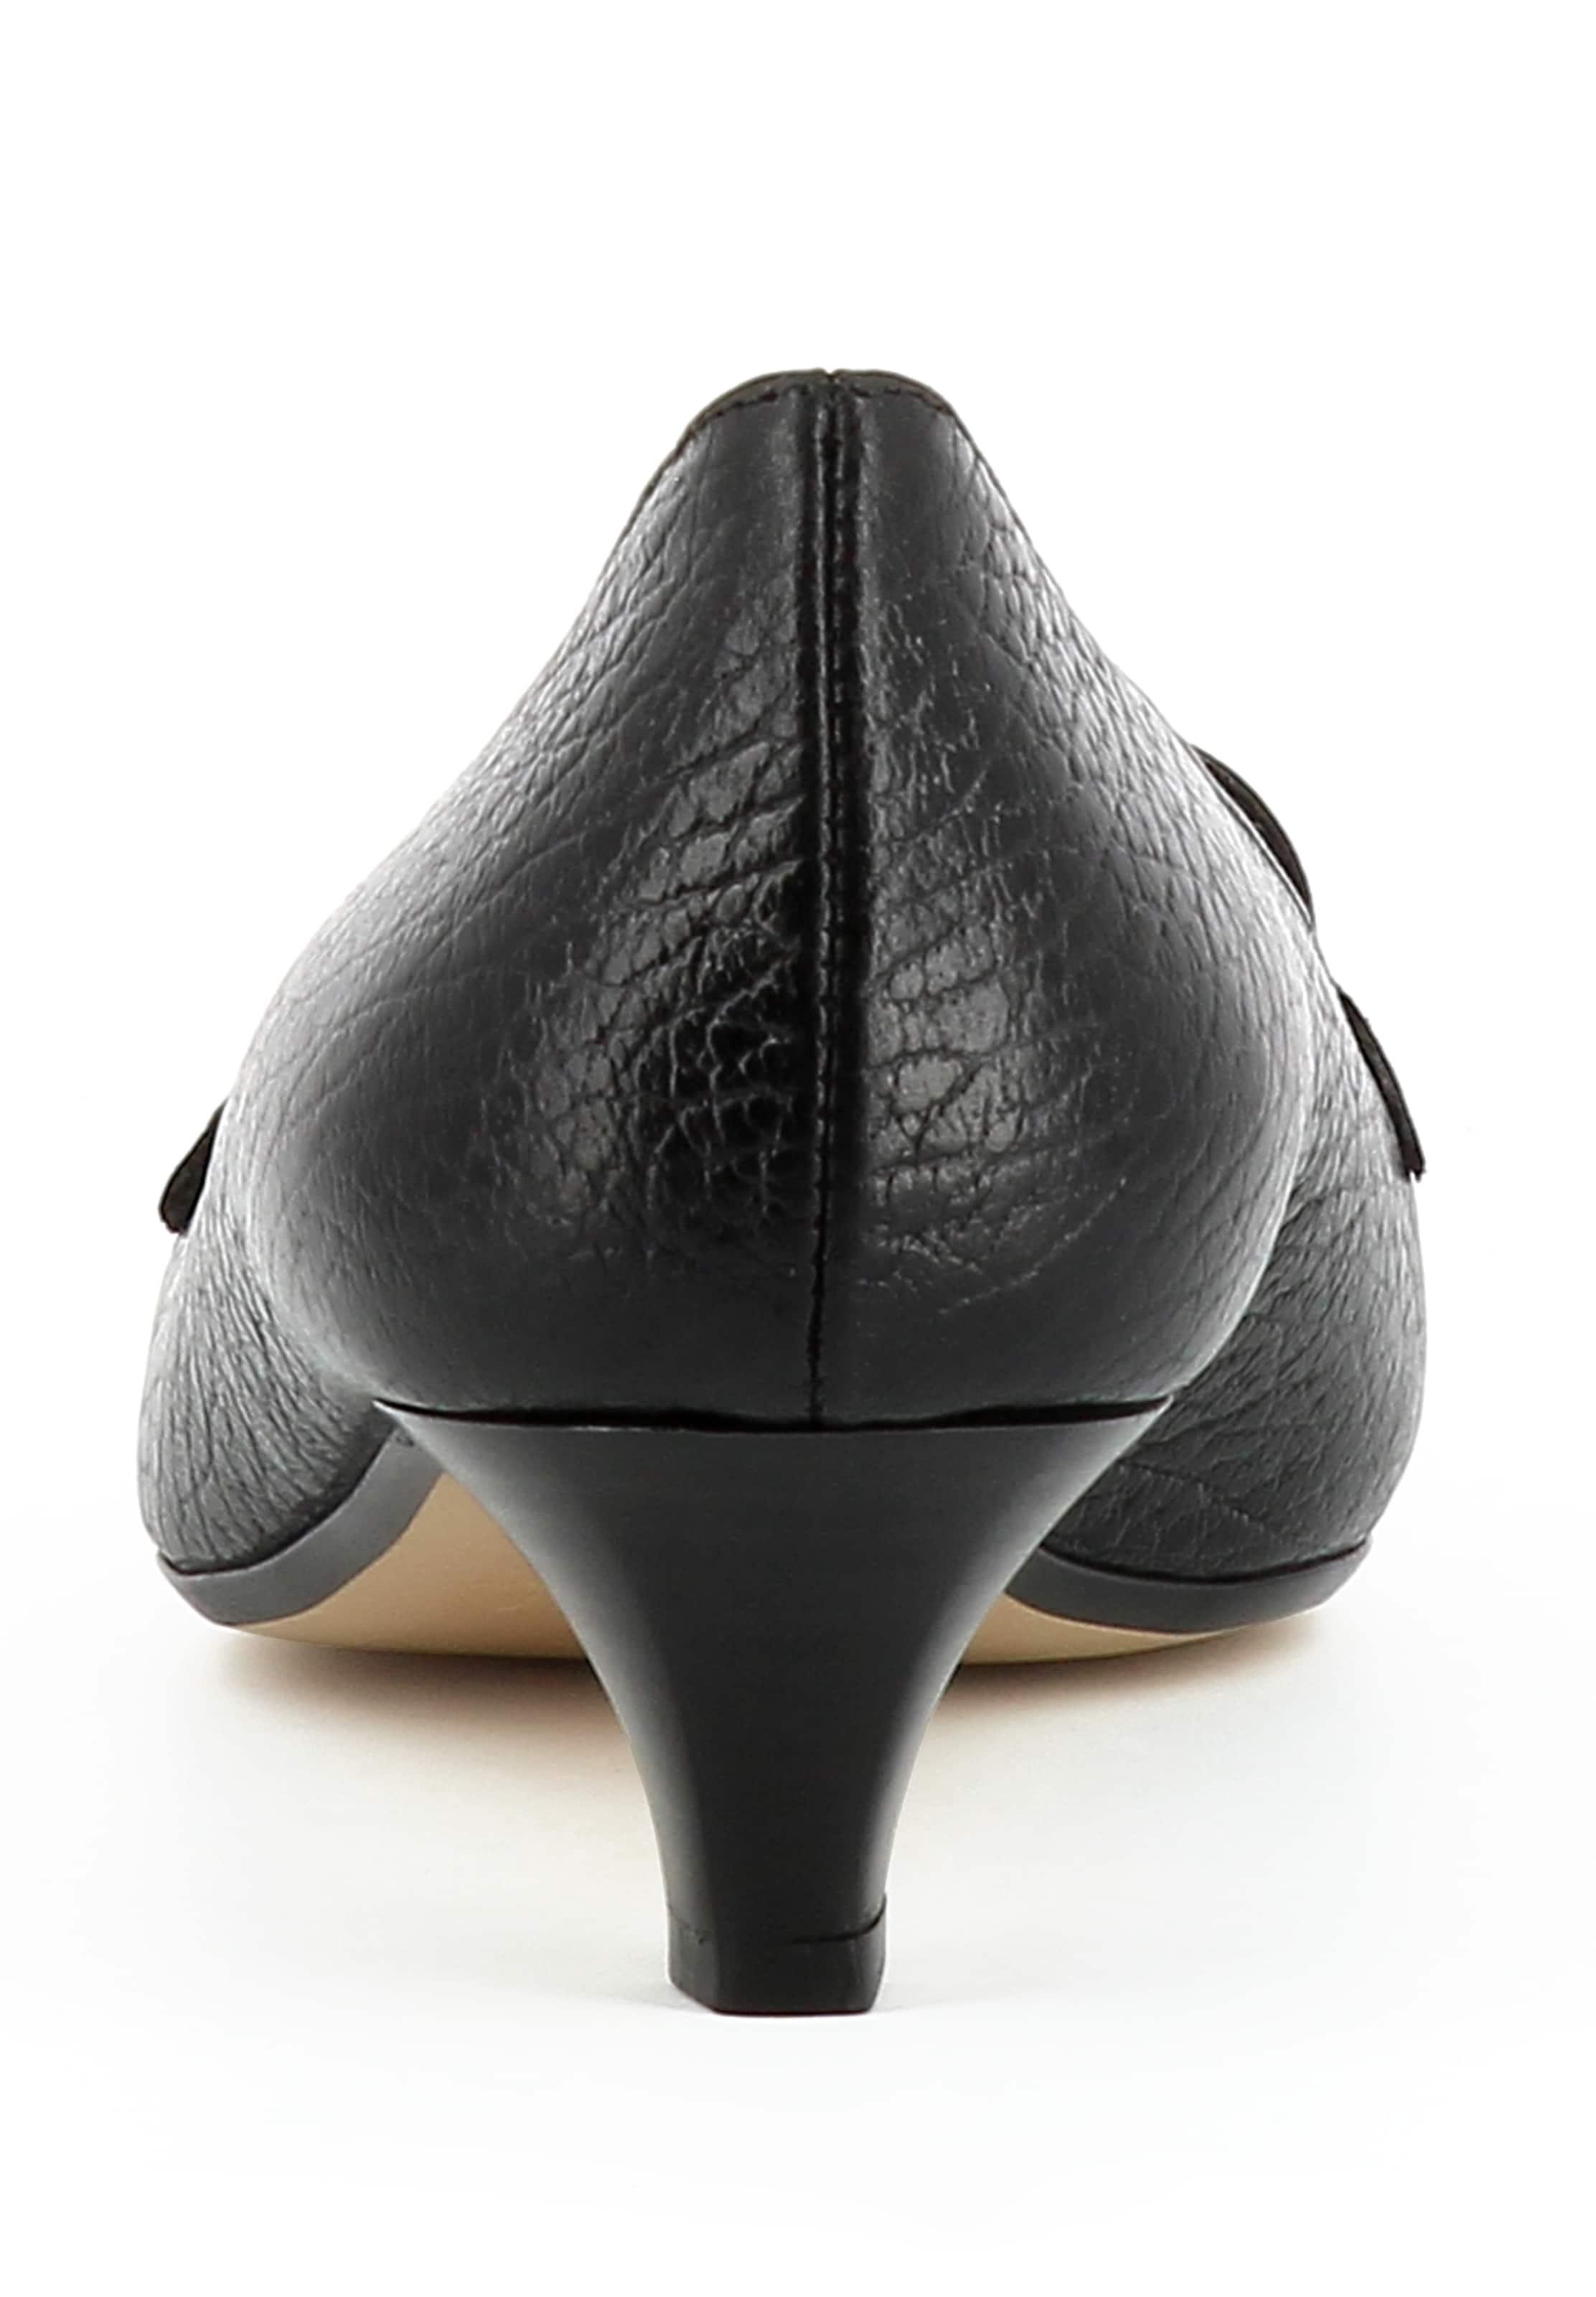 Escarpins Noir En Noir Escarpins Evita Escarpins Noir Evita Evita En En USqMVzpG